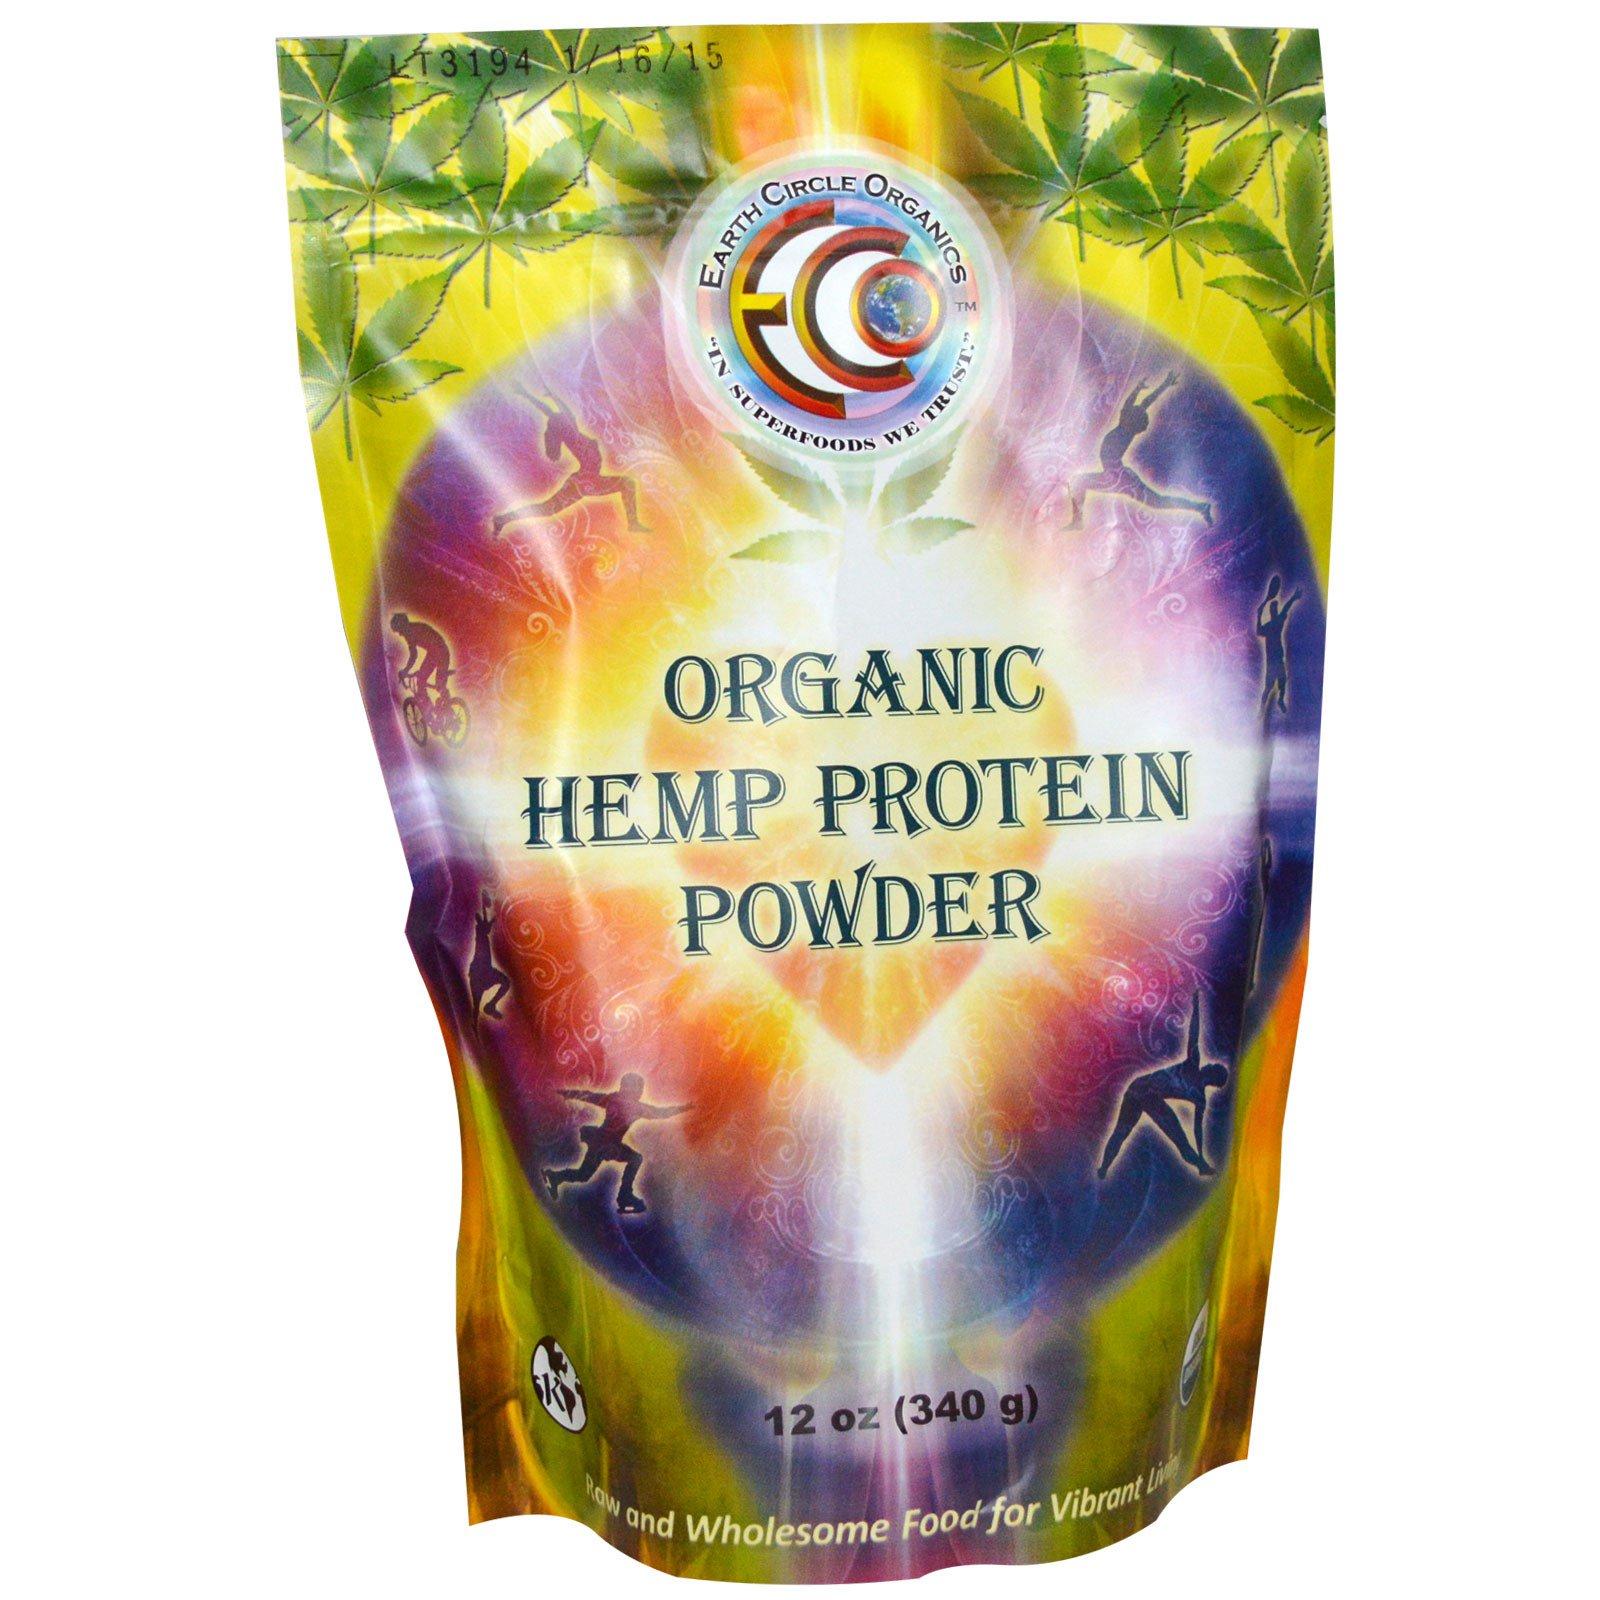 Earth Circle Organics, Organic Hemp Protein Powder, 12 oz (340 g)  (Discontinued Item)